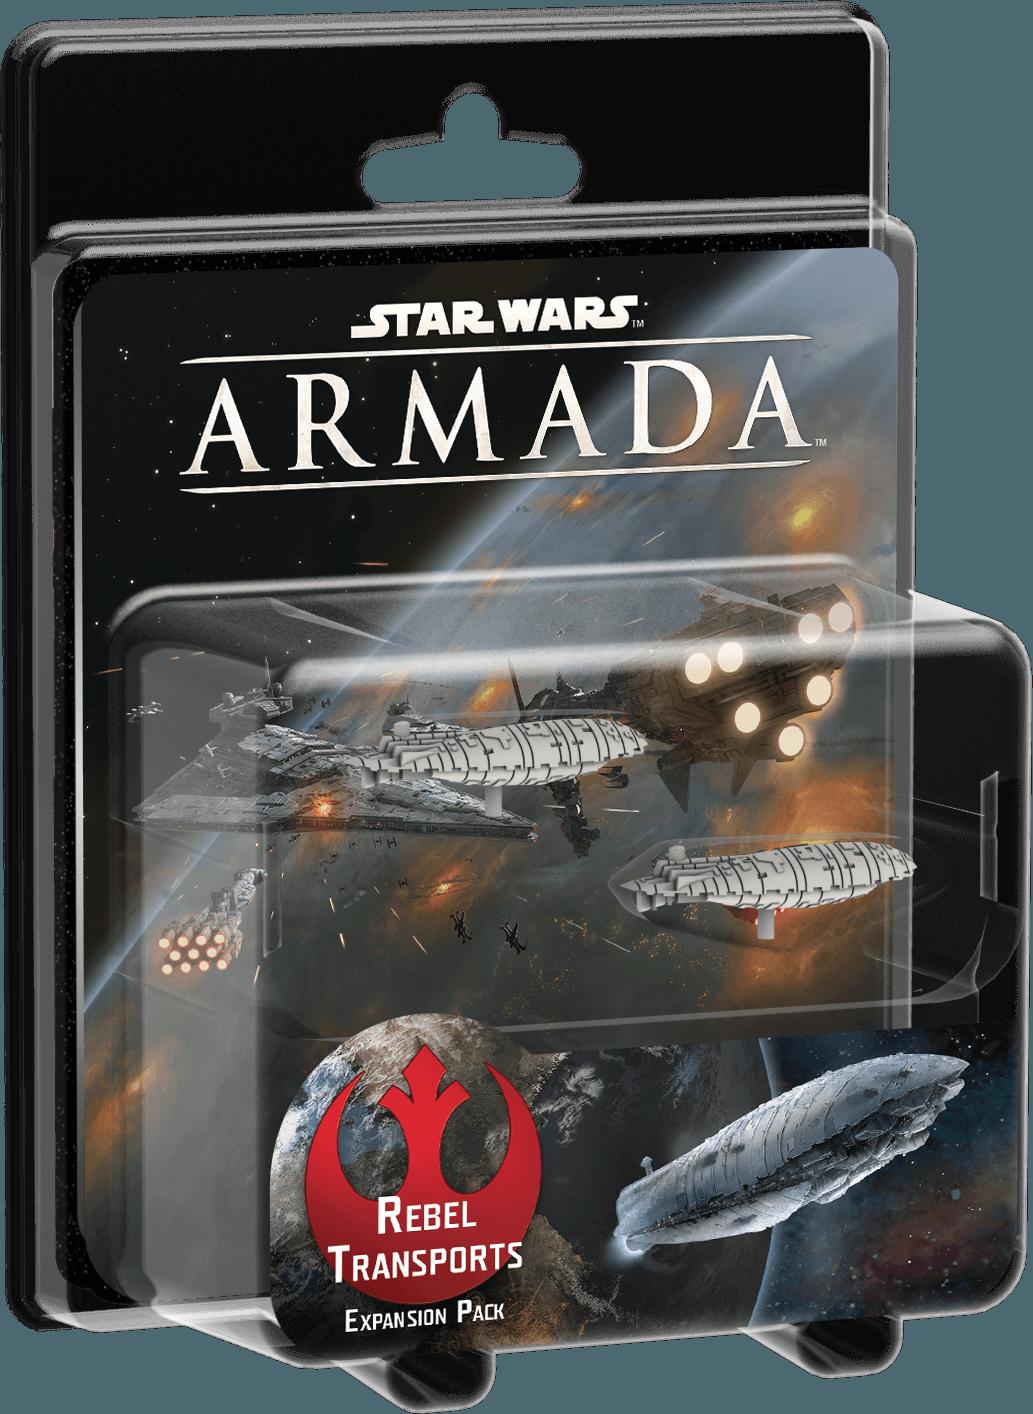 Star Wars: Armada –  Rebel Transports Expansion Pack